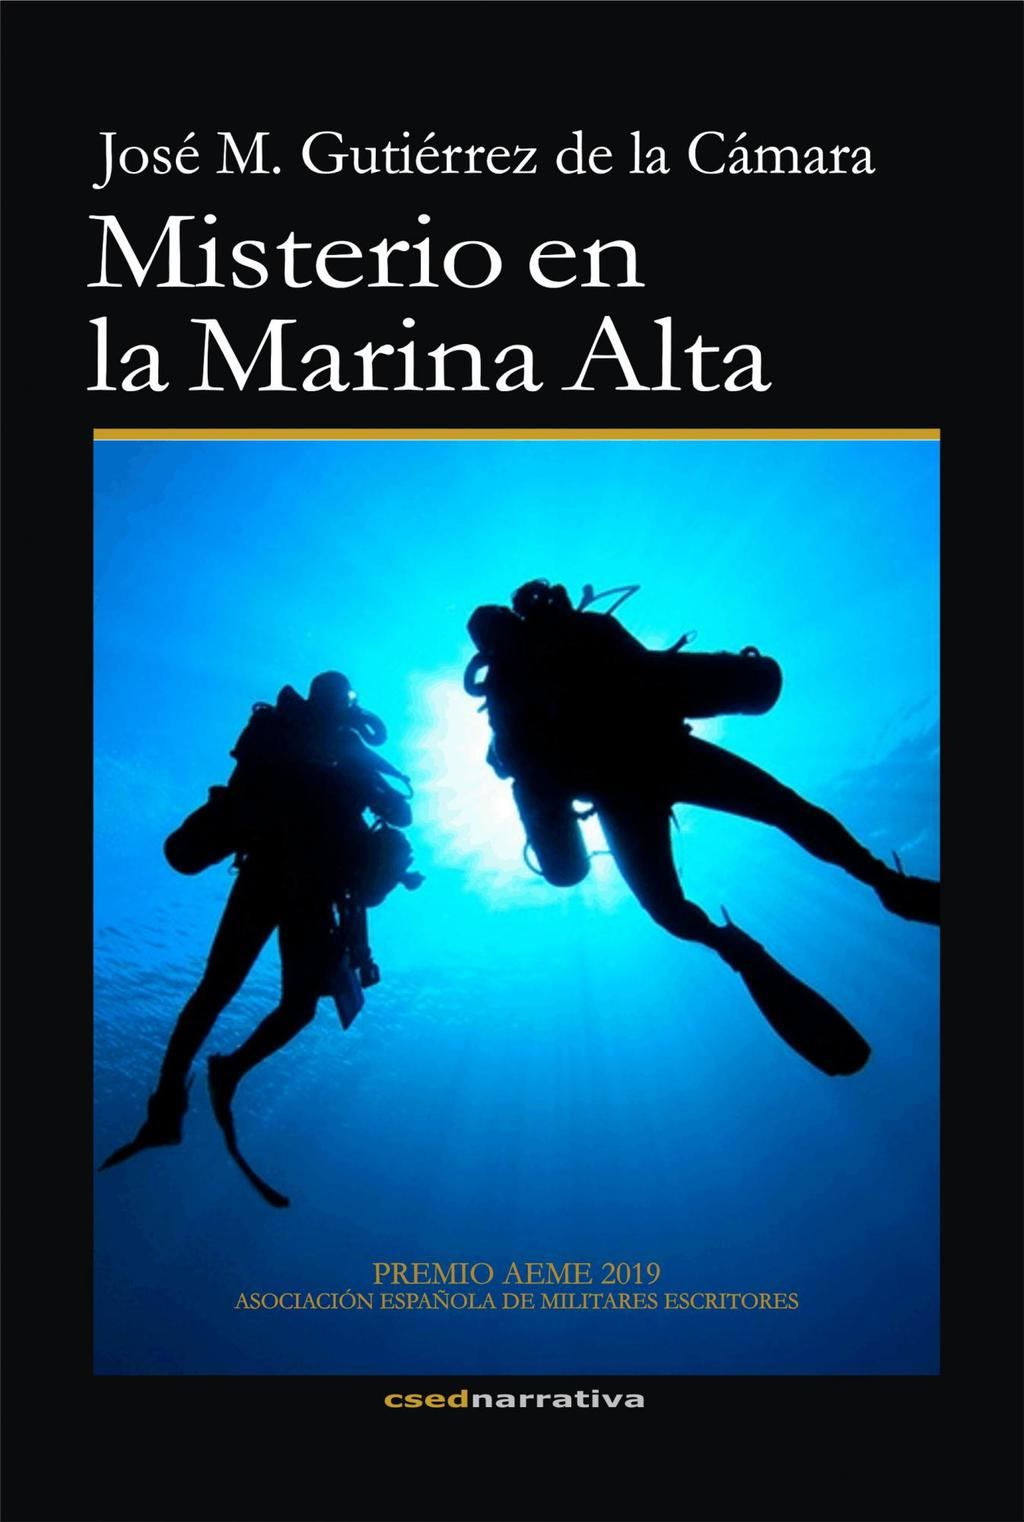 Misterio en la Marina Alta, de José M. Gutiérrez de la Cámara